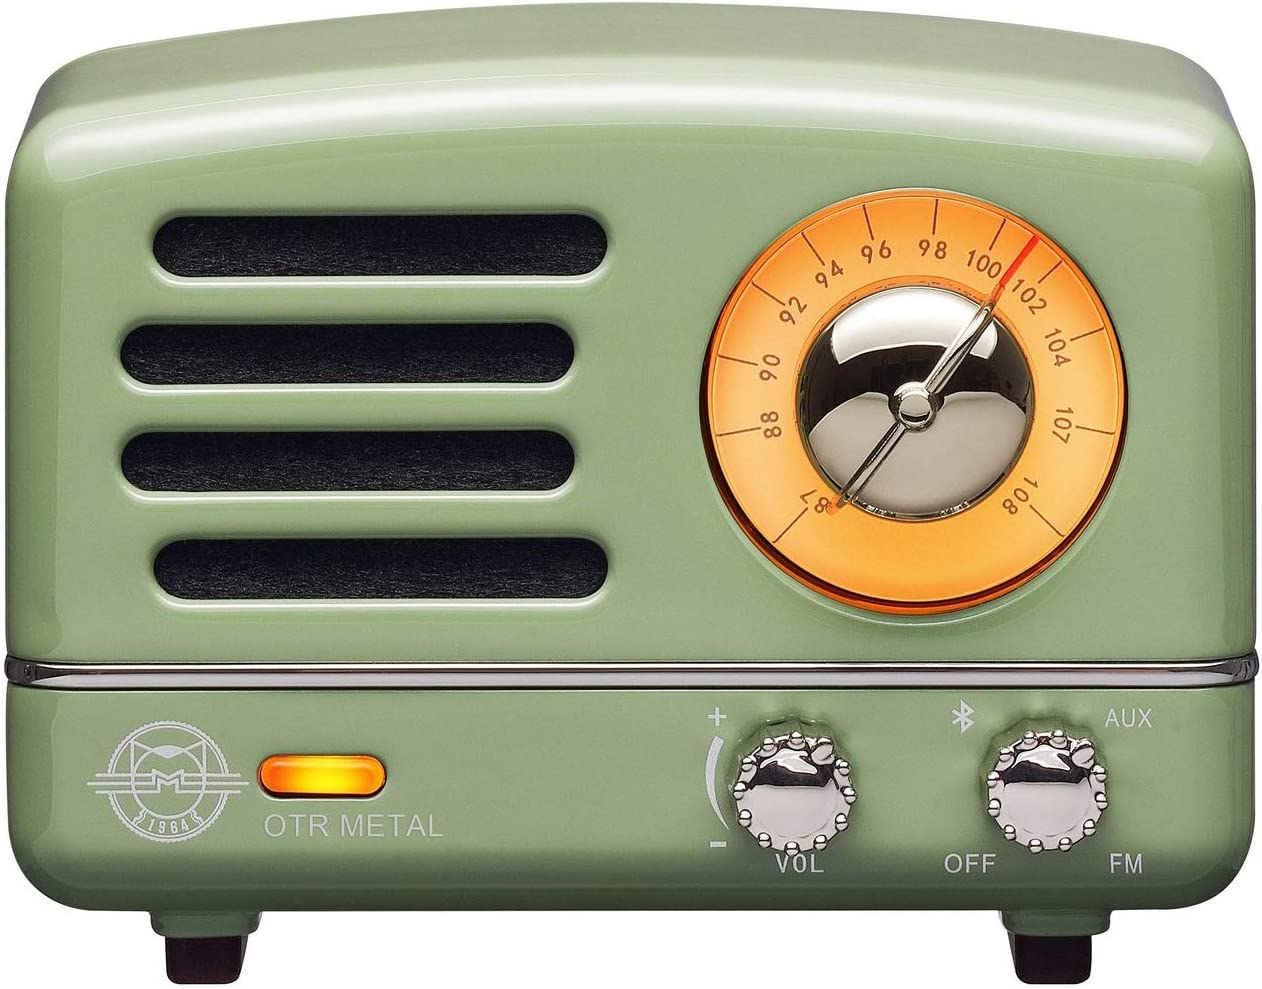 Muzen Portable Wireless High Definition Audio FM Radio Bluetooth Speaker, Metal Green with Travel Case – Classic Vintage Retro Design